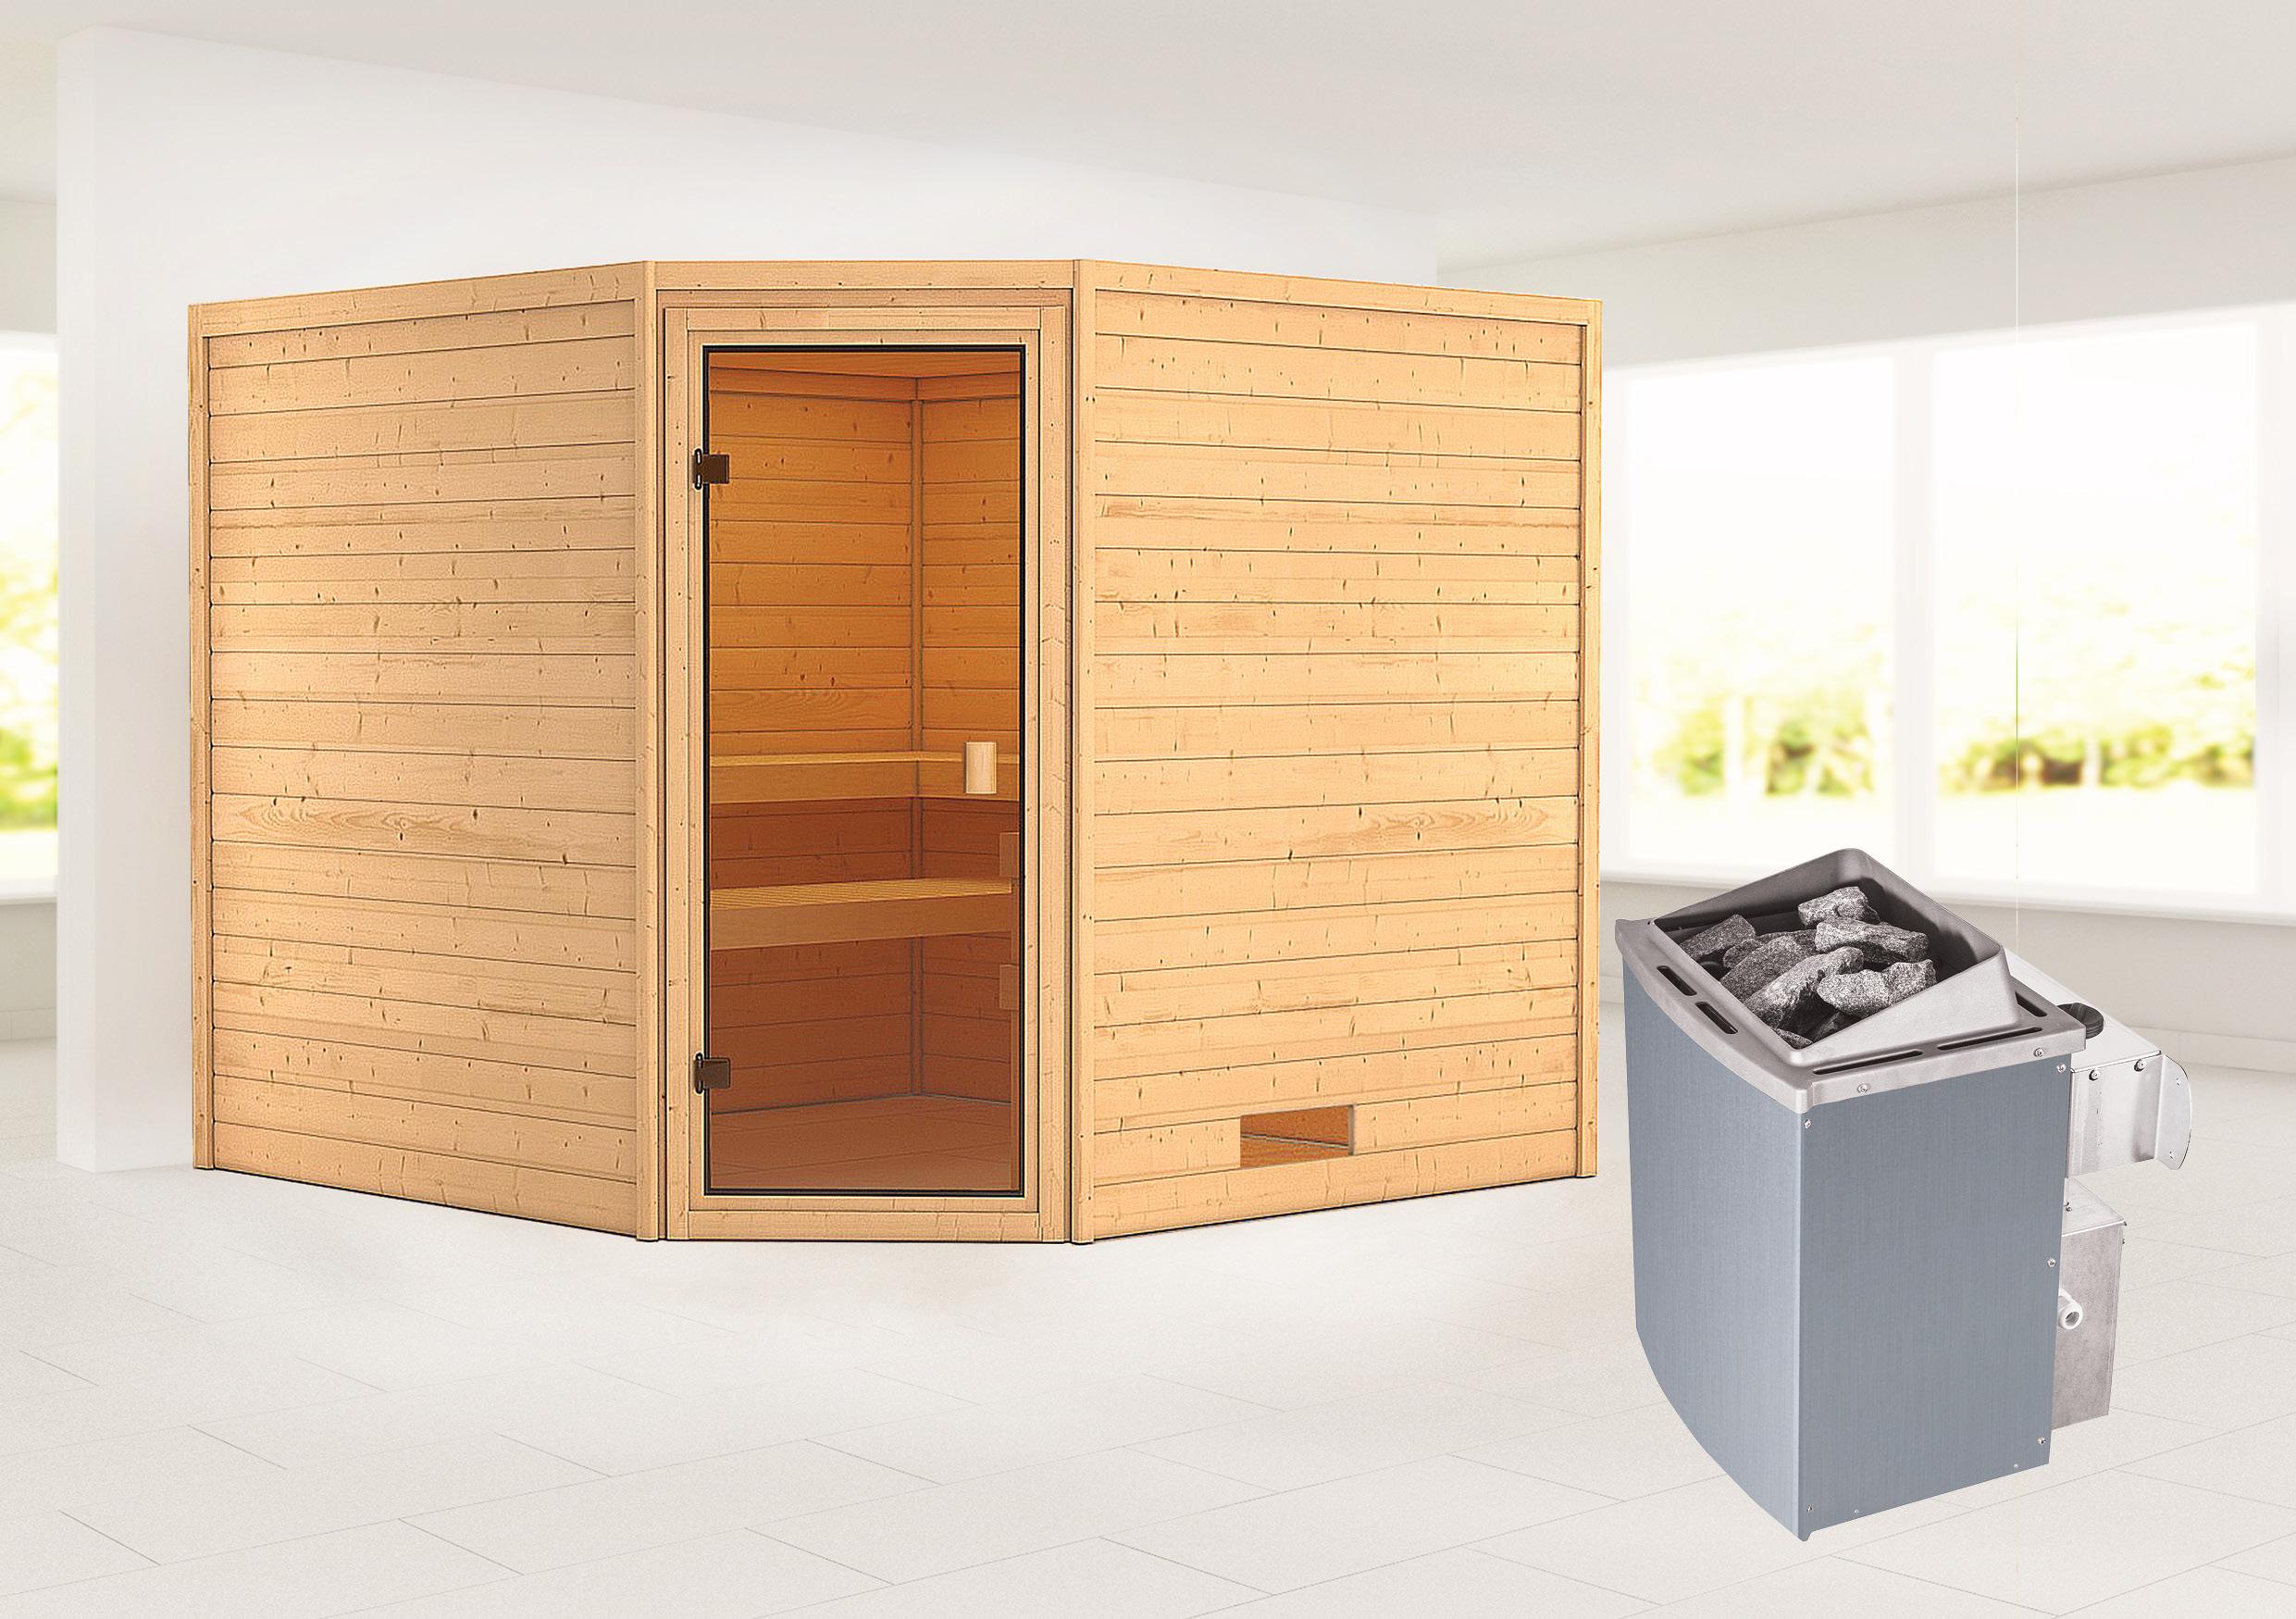 Woodfeeling Sauna Dalia 38mm Saunaofen 9 kW intern Bild 1